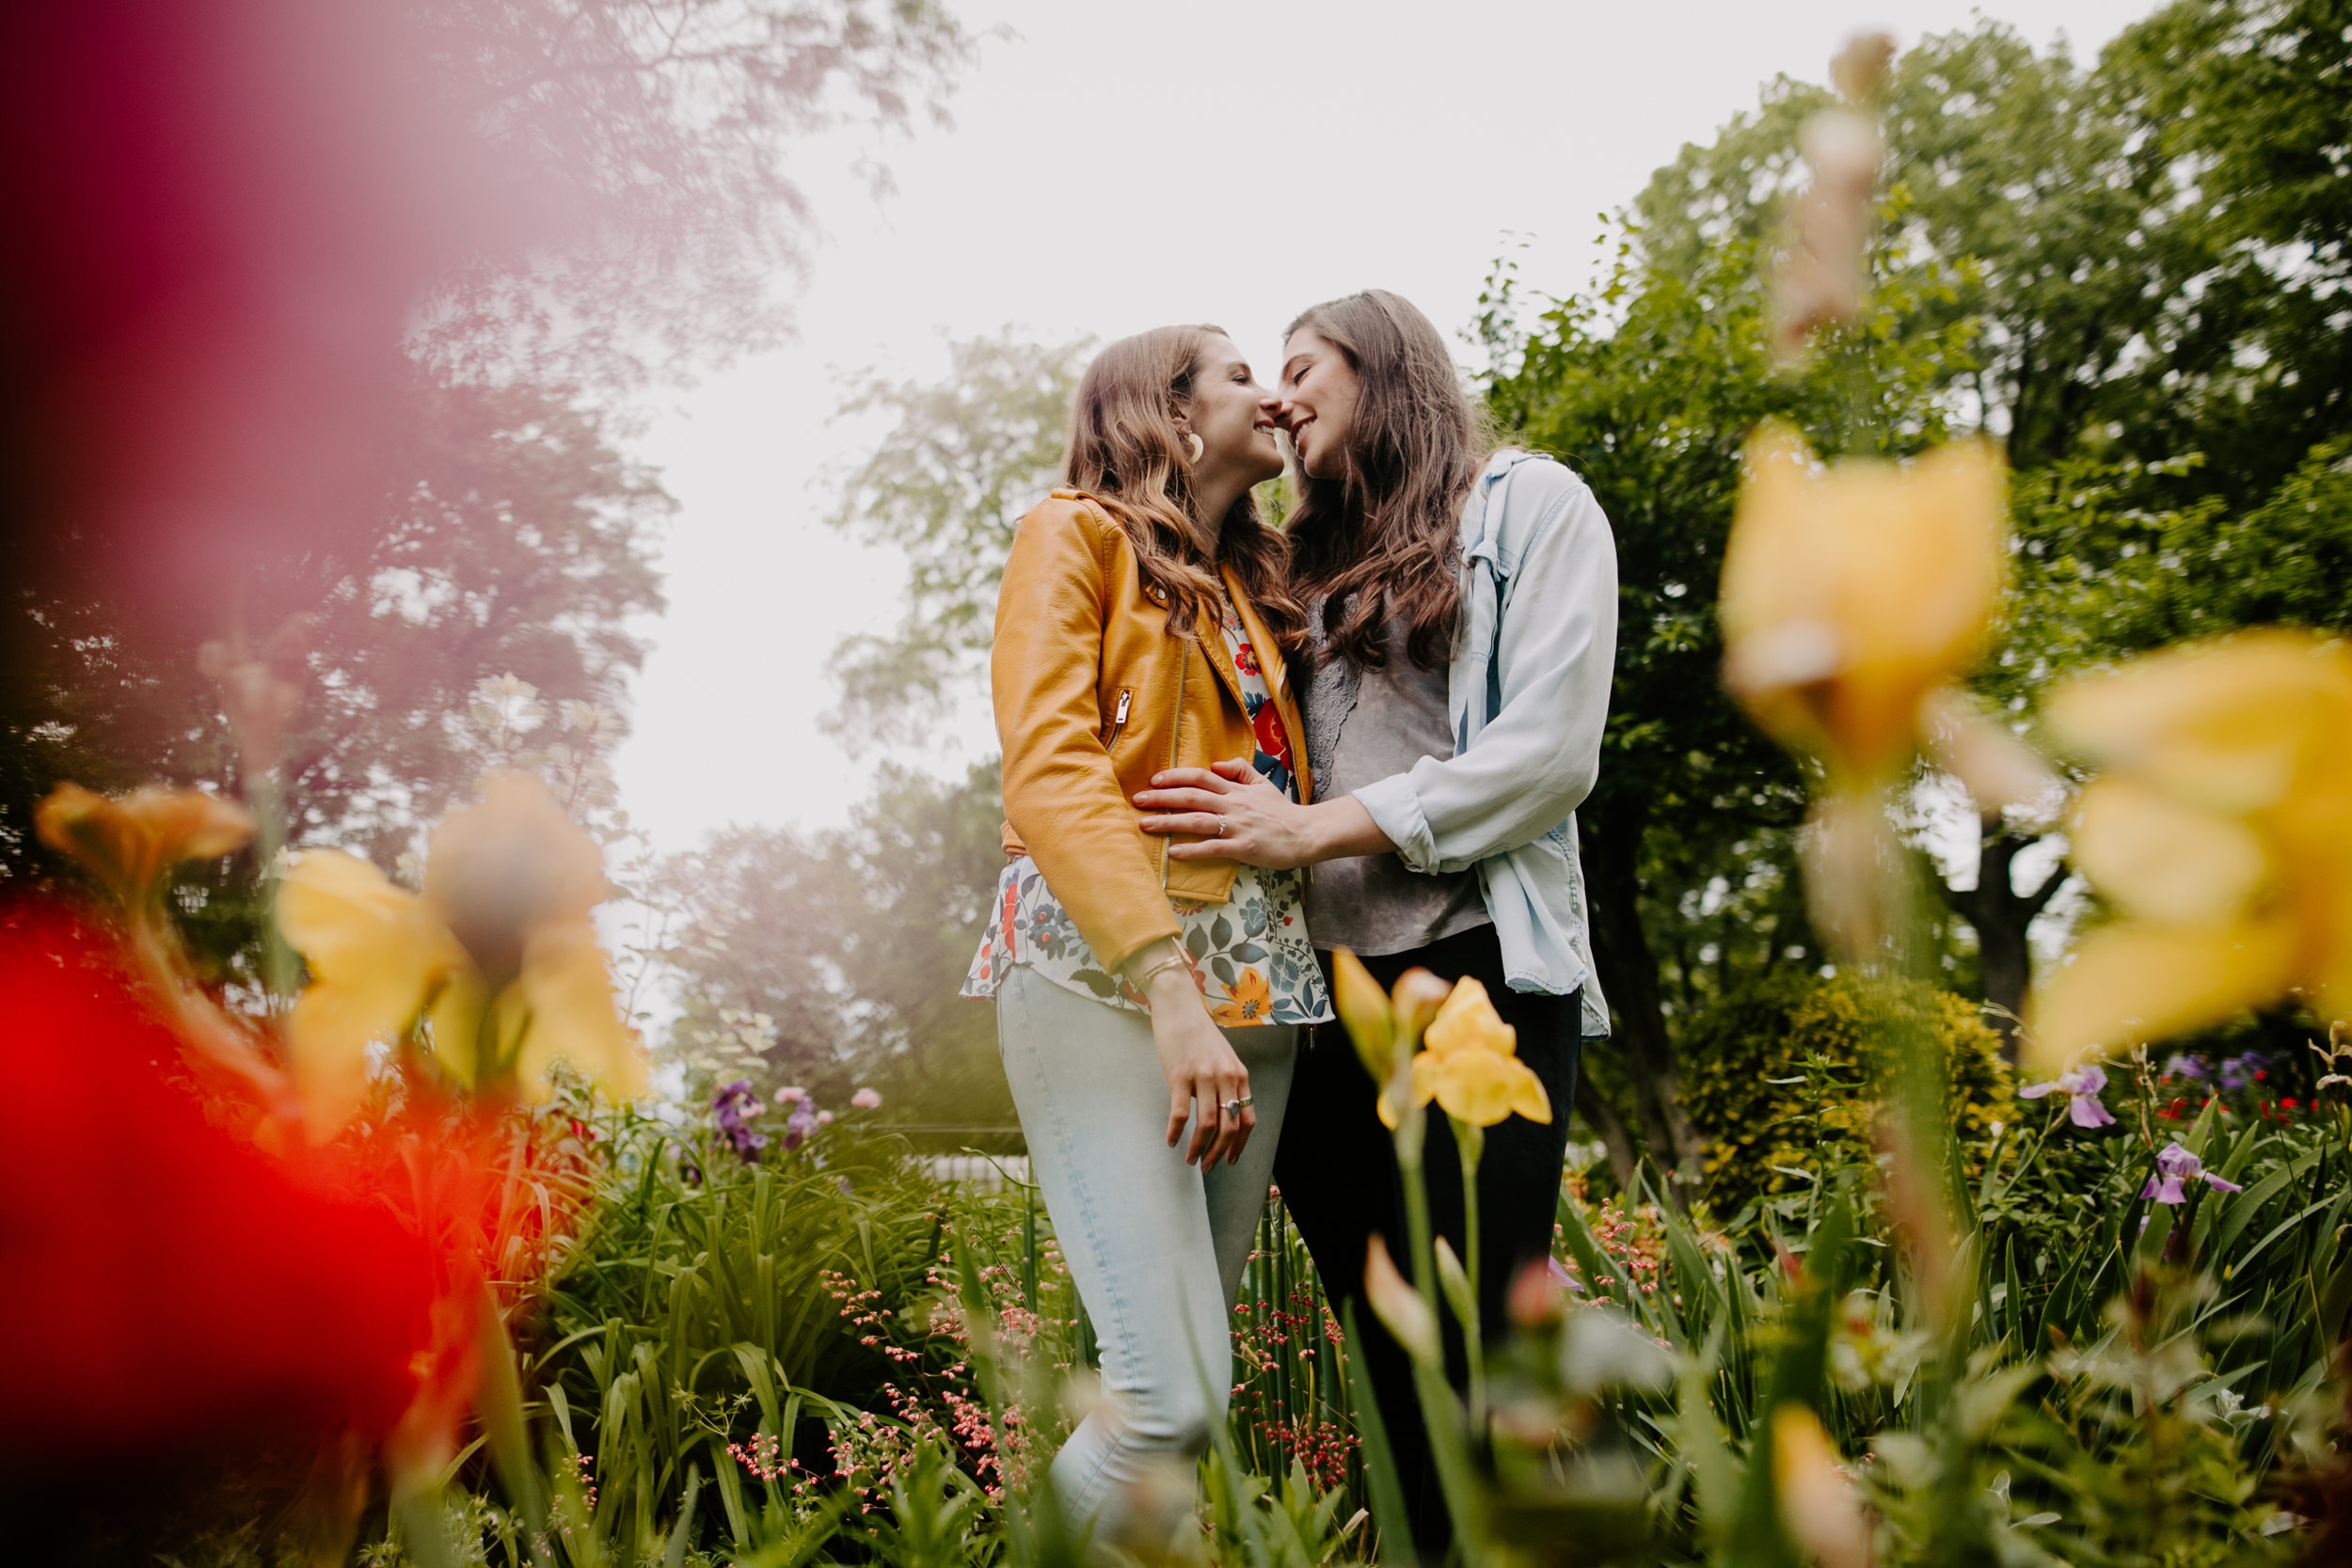 BrittanyMaggie__NYC_Engagement_TowardsTheMoon-47.jpg